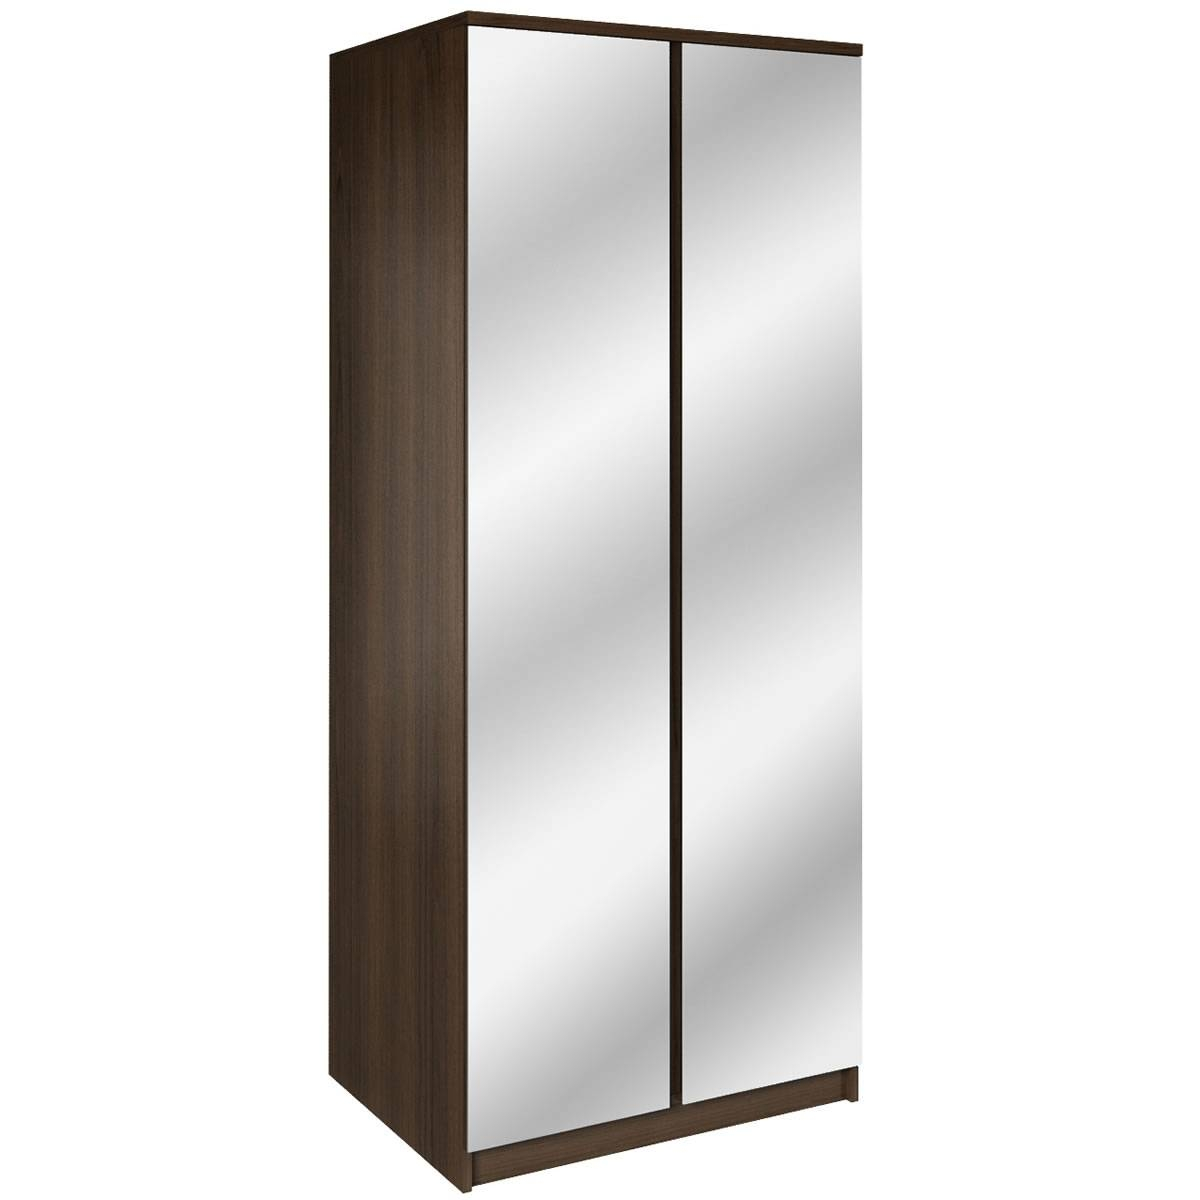 Closet Wardrobe Cheap | 2016 Closet Ideas & Designs in Cheap 2 Door Wardrobes (Image 4 of 15)